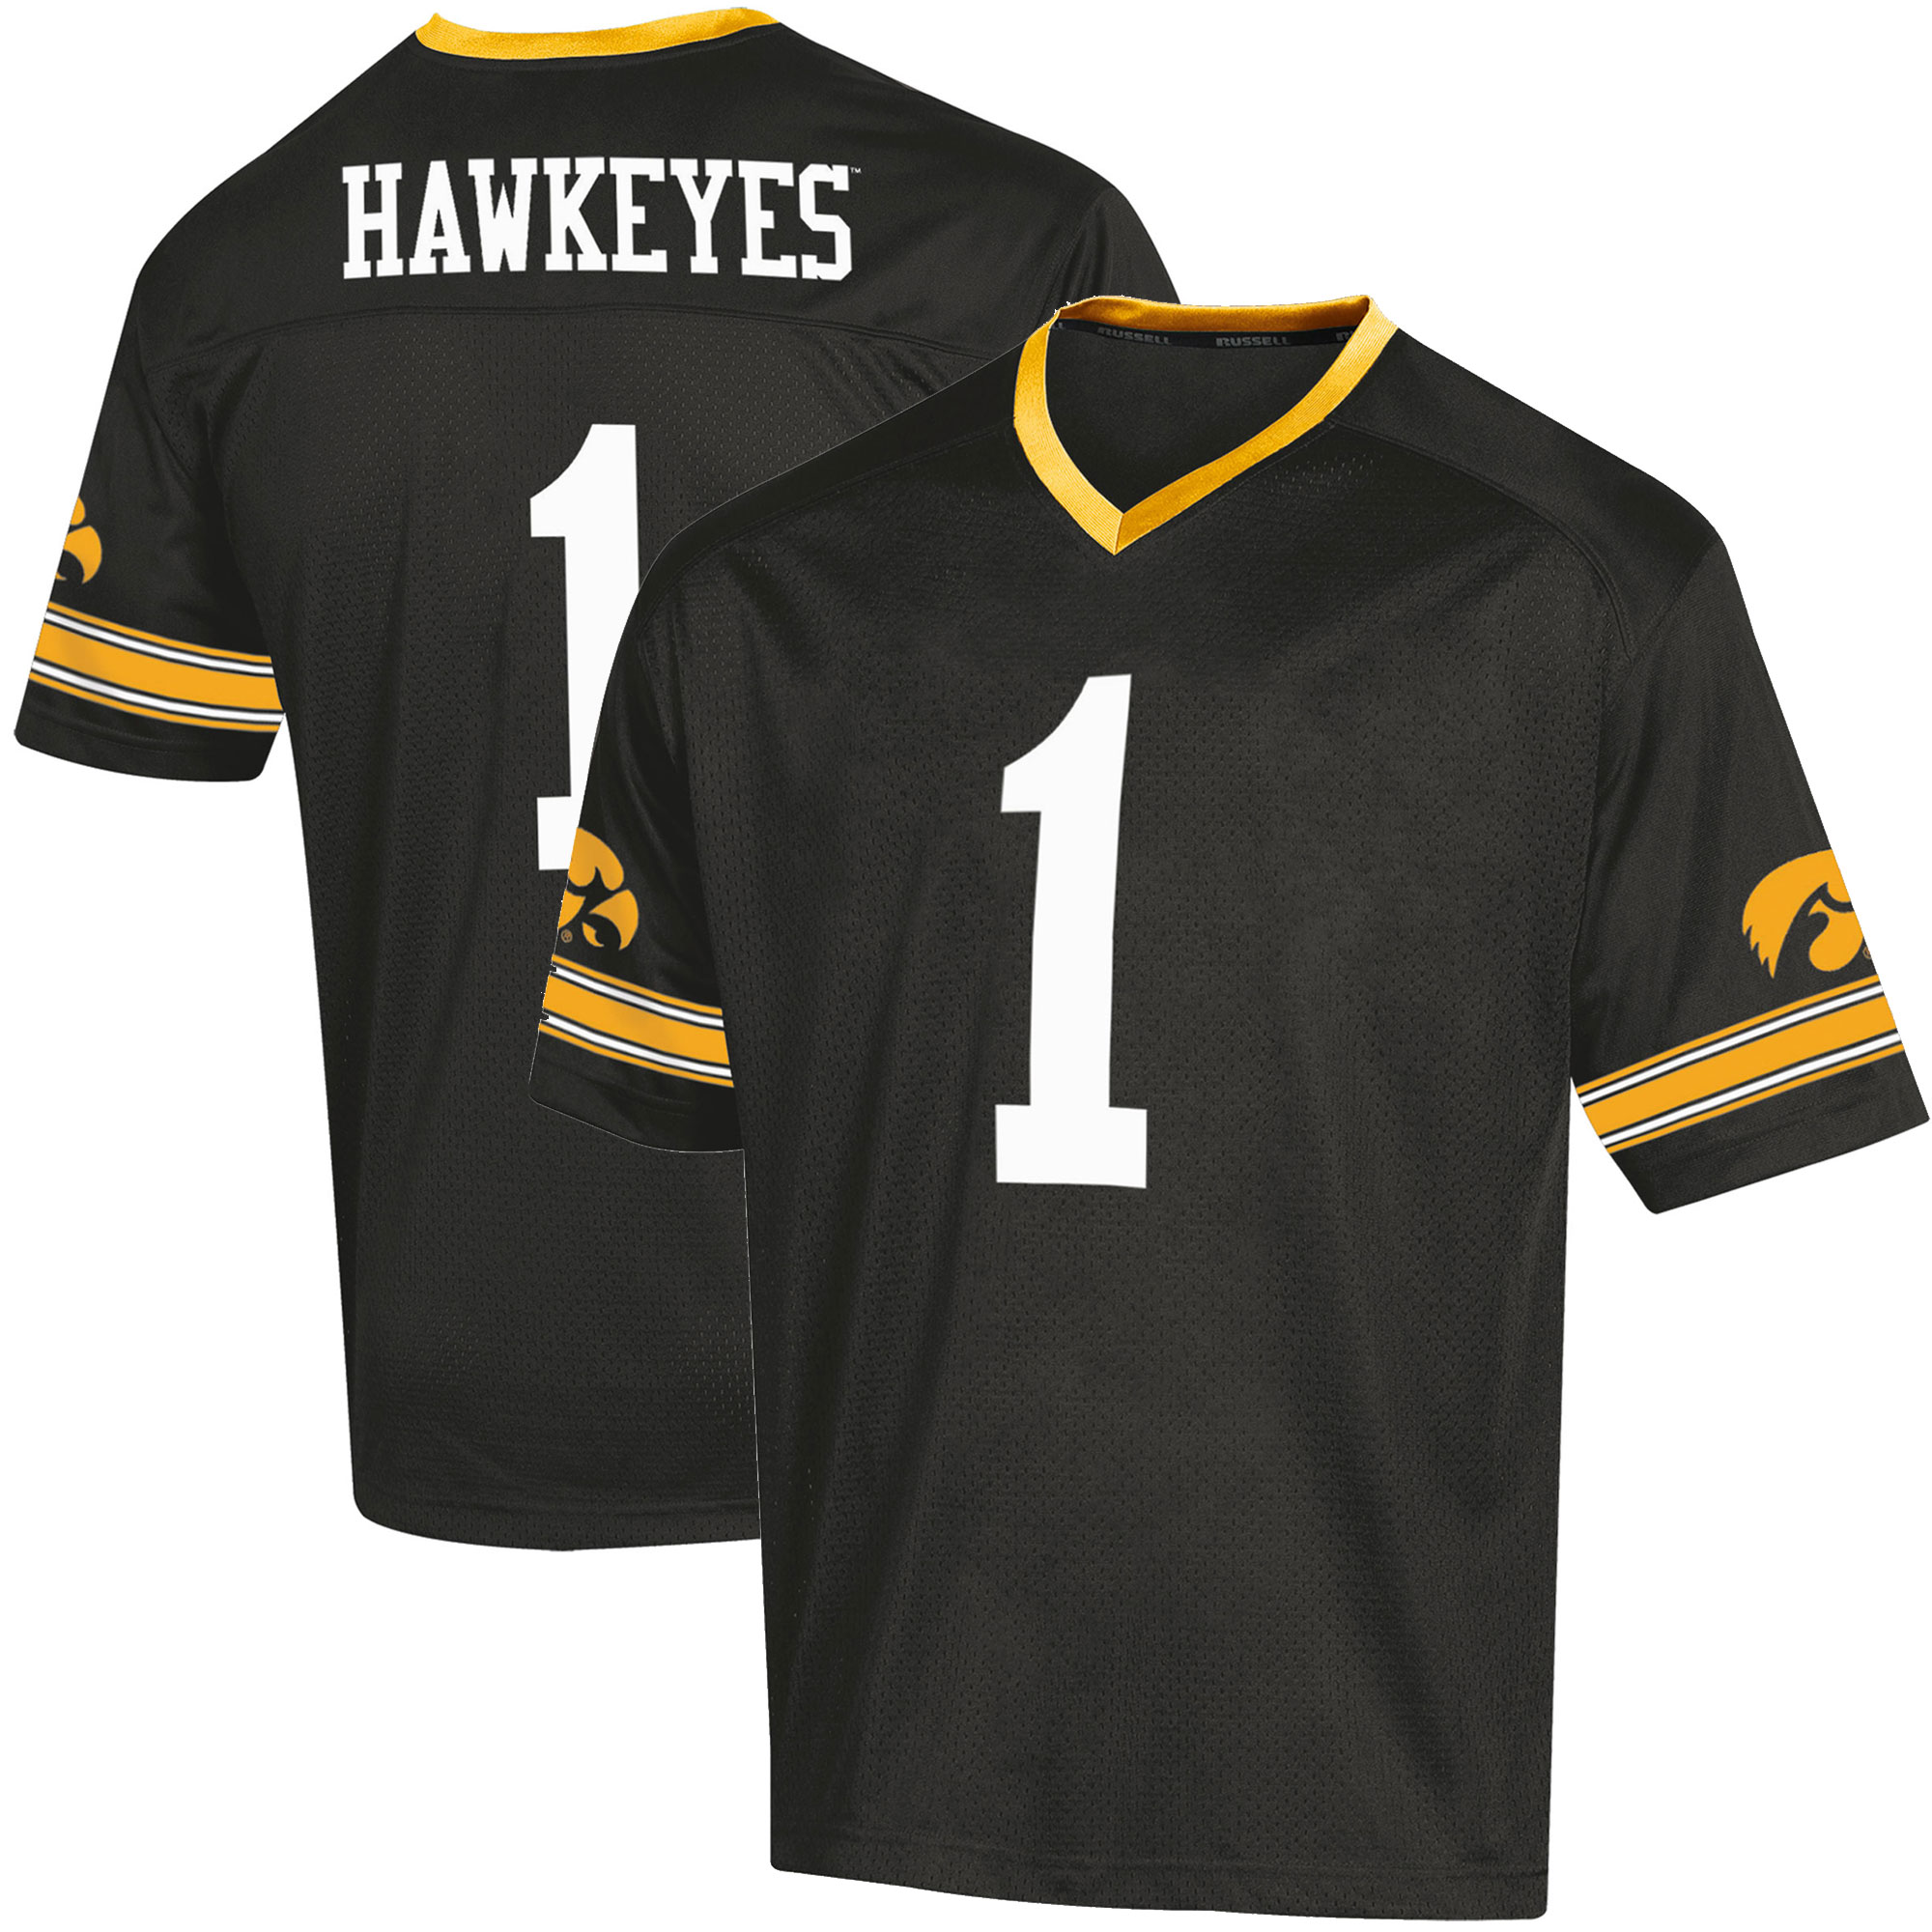 Toddler Russell Black Iowa Hawkeyes Replica Football Jersey